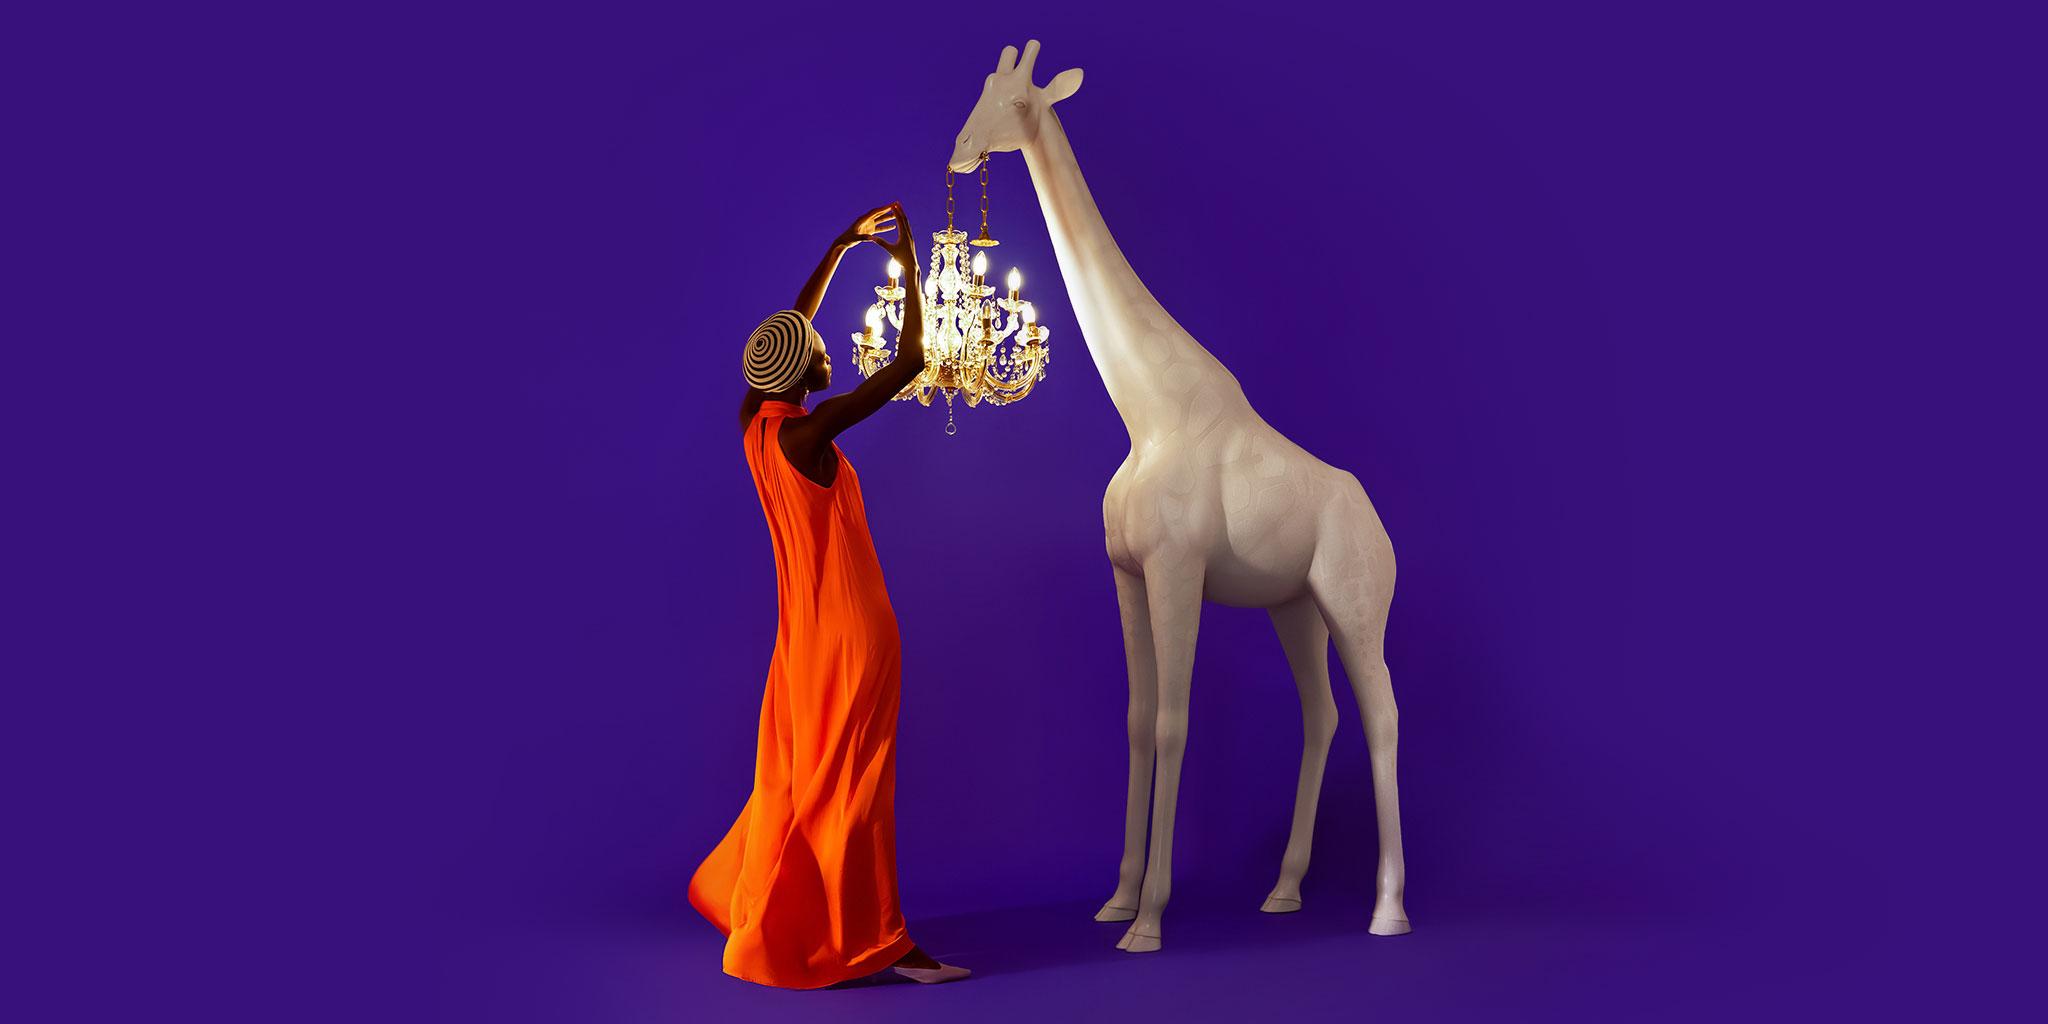 Giraffe in Love collection